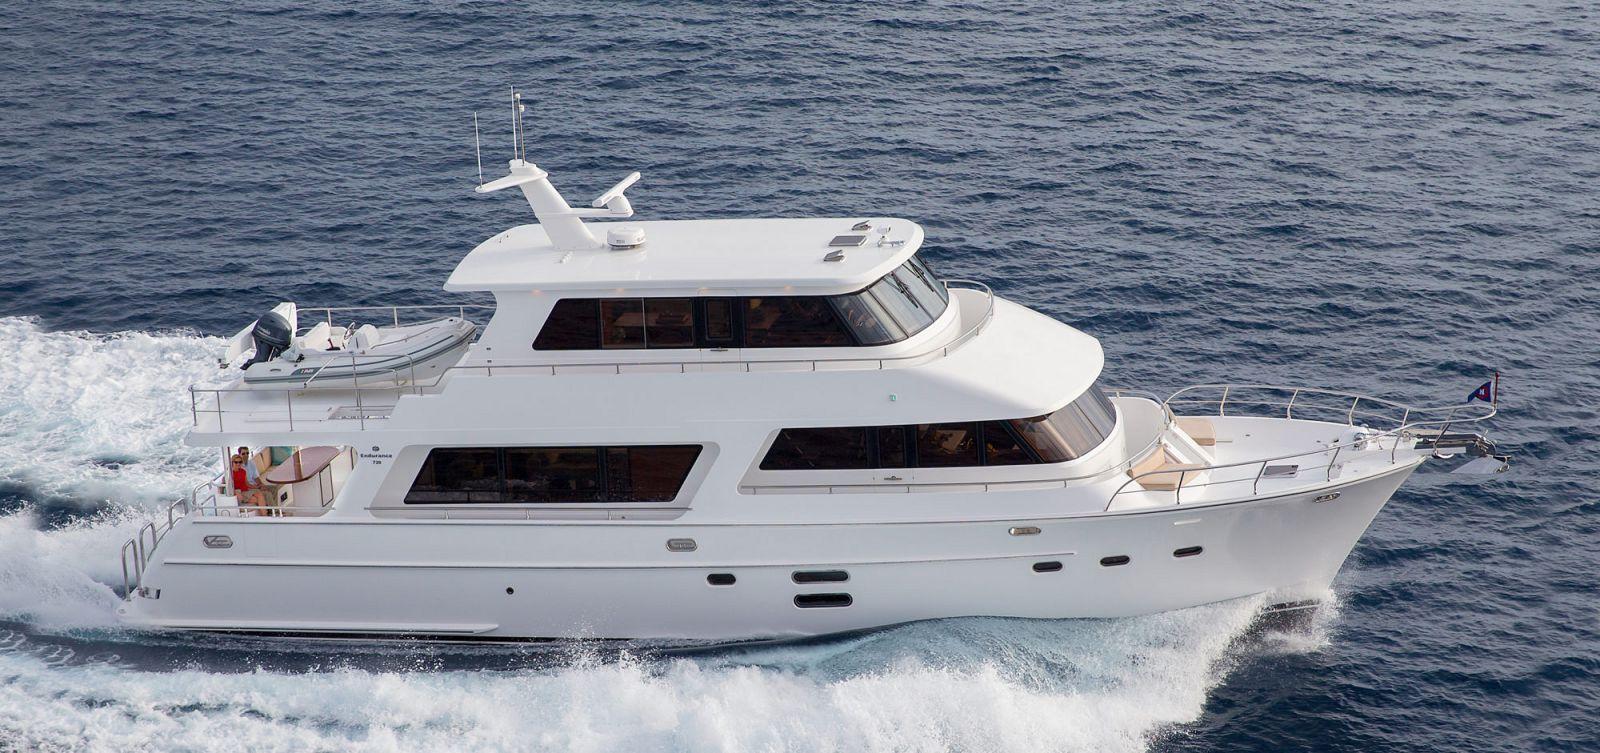 Endurance Yachts 720 Profile